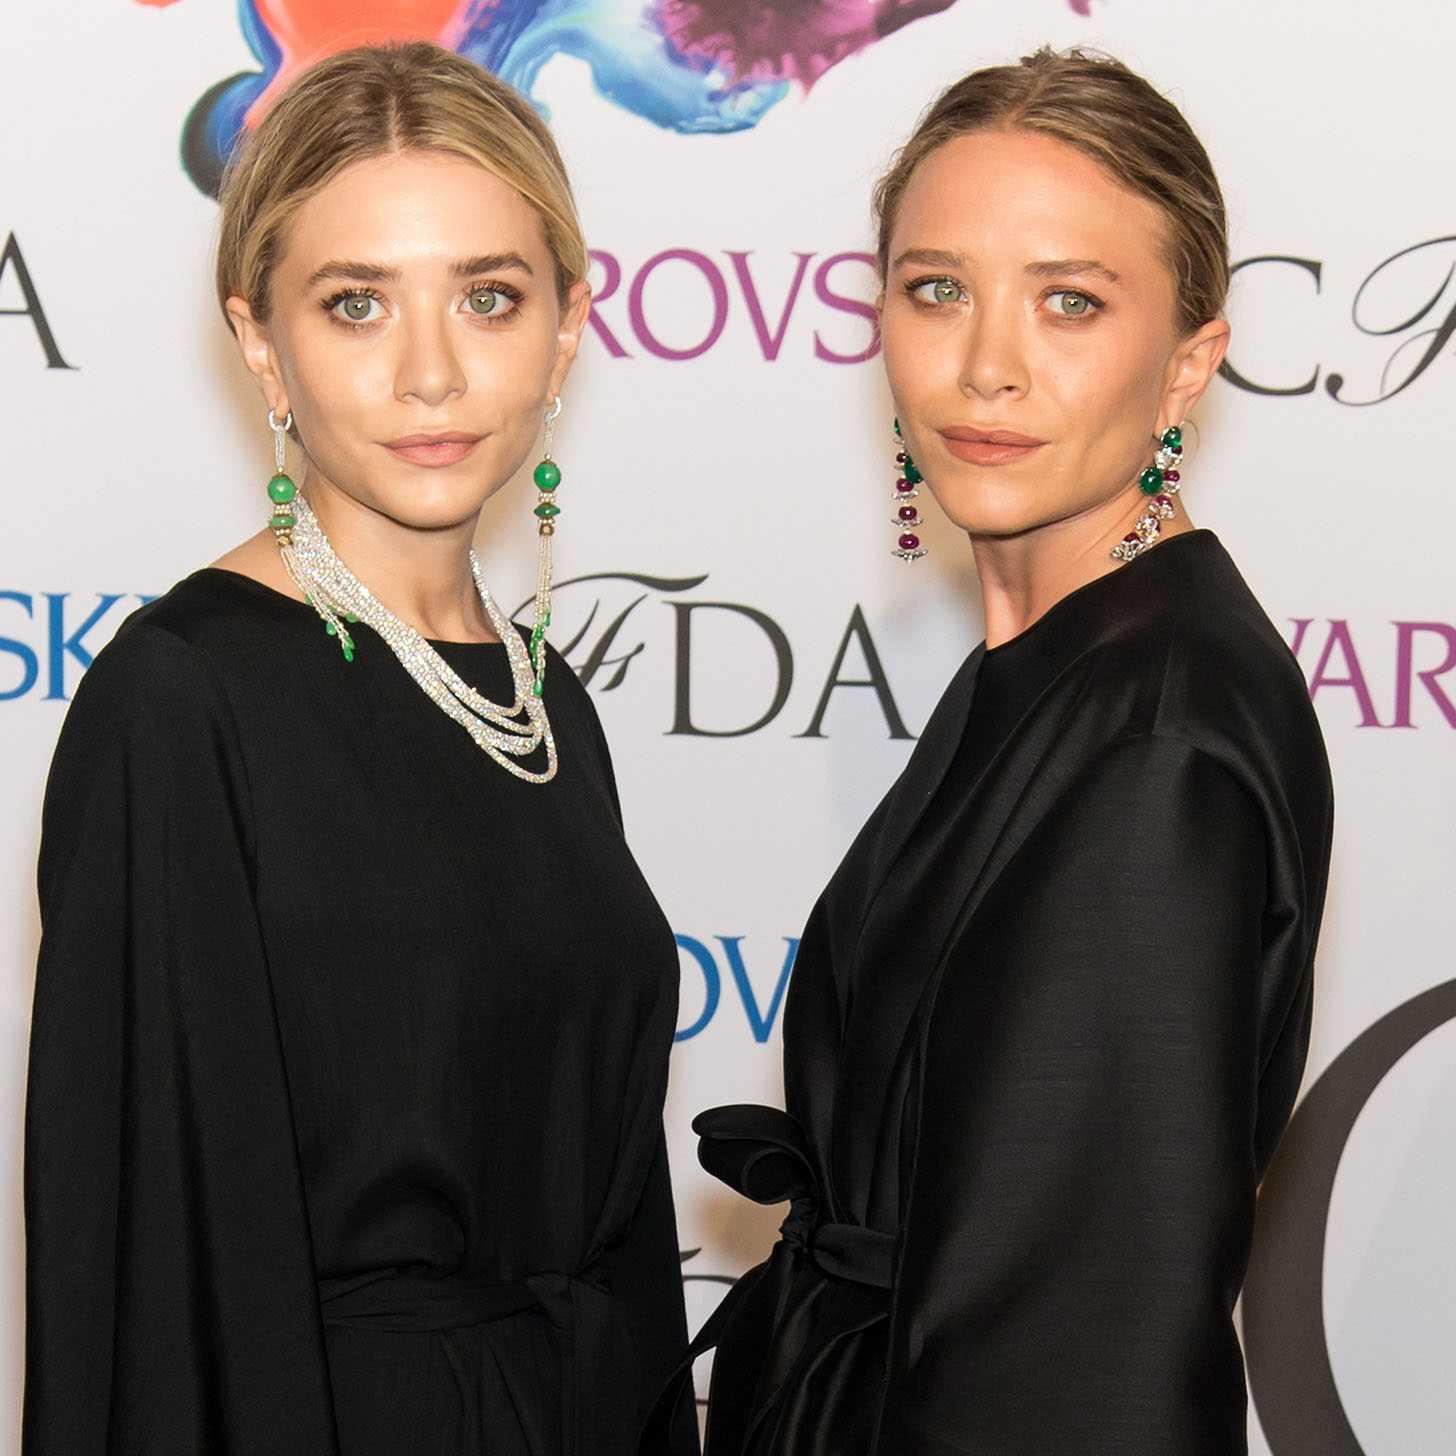 Olsen Twins Sued For Intern Treatment | Olsen